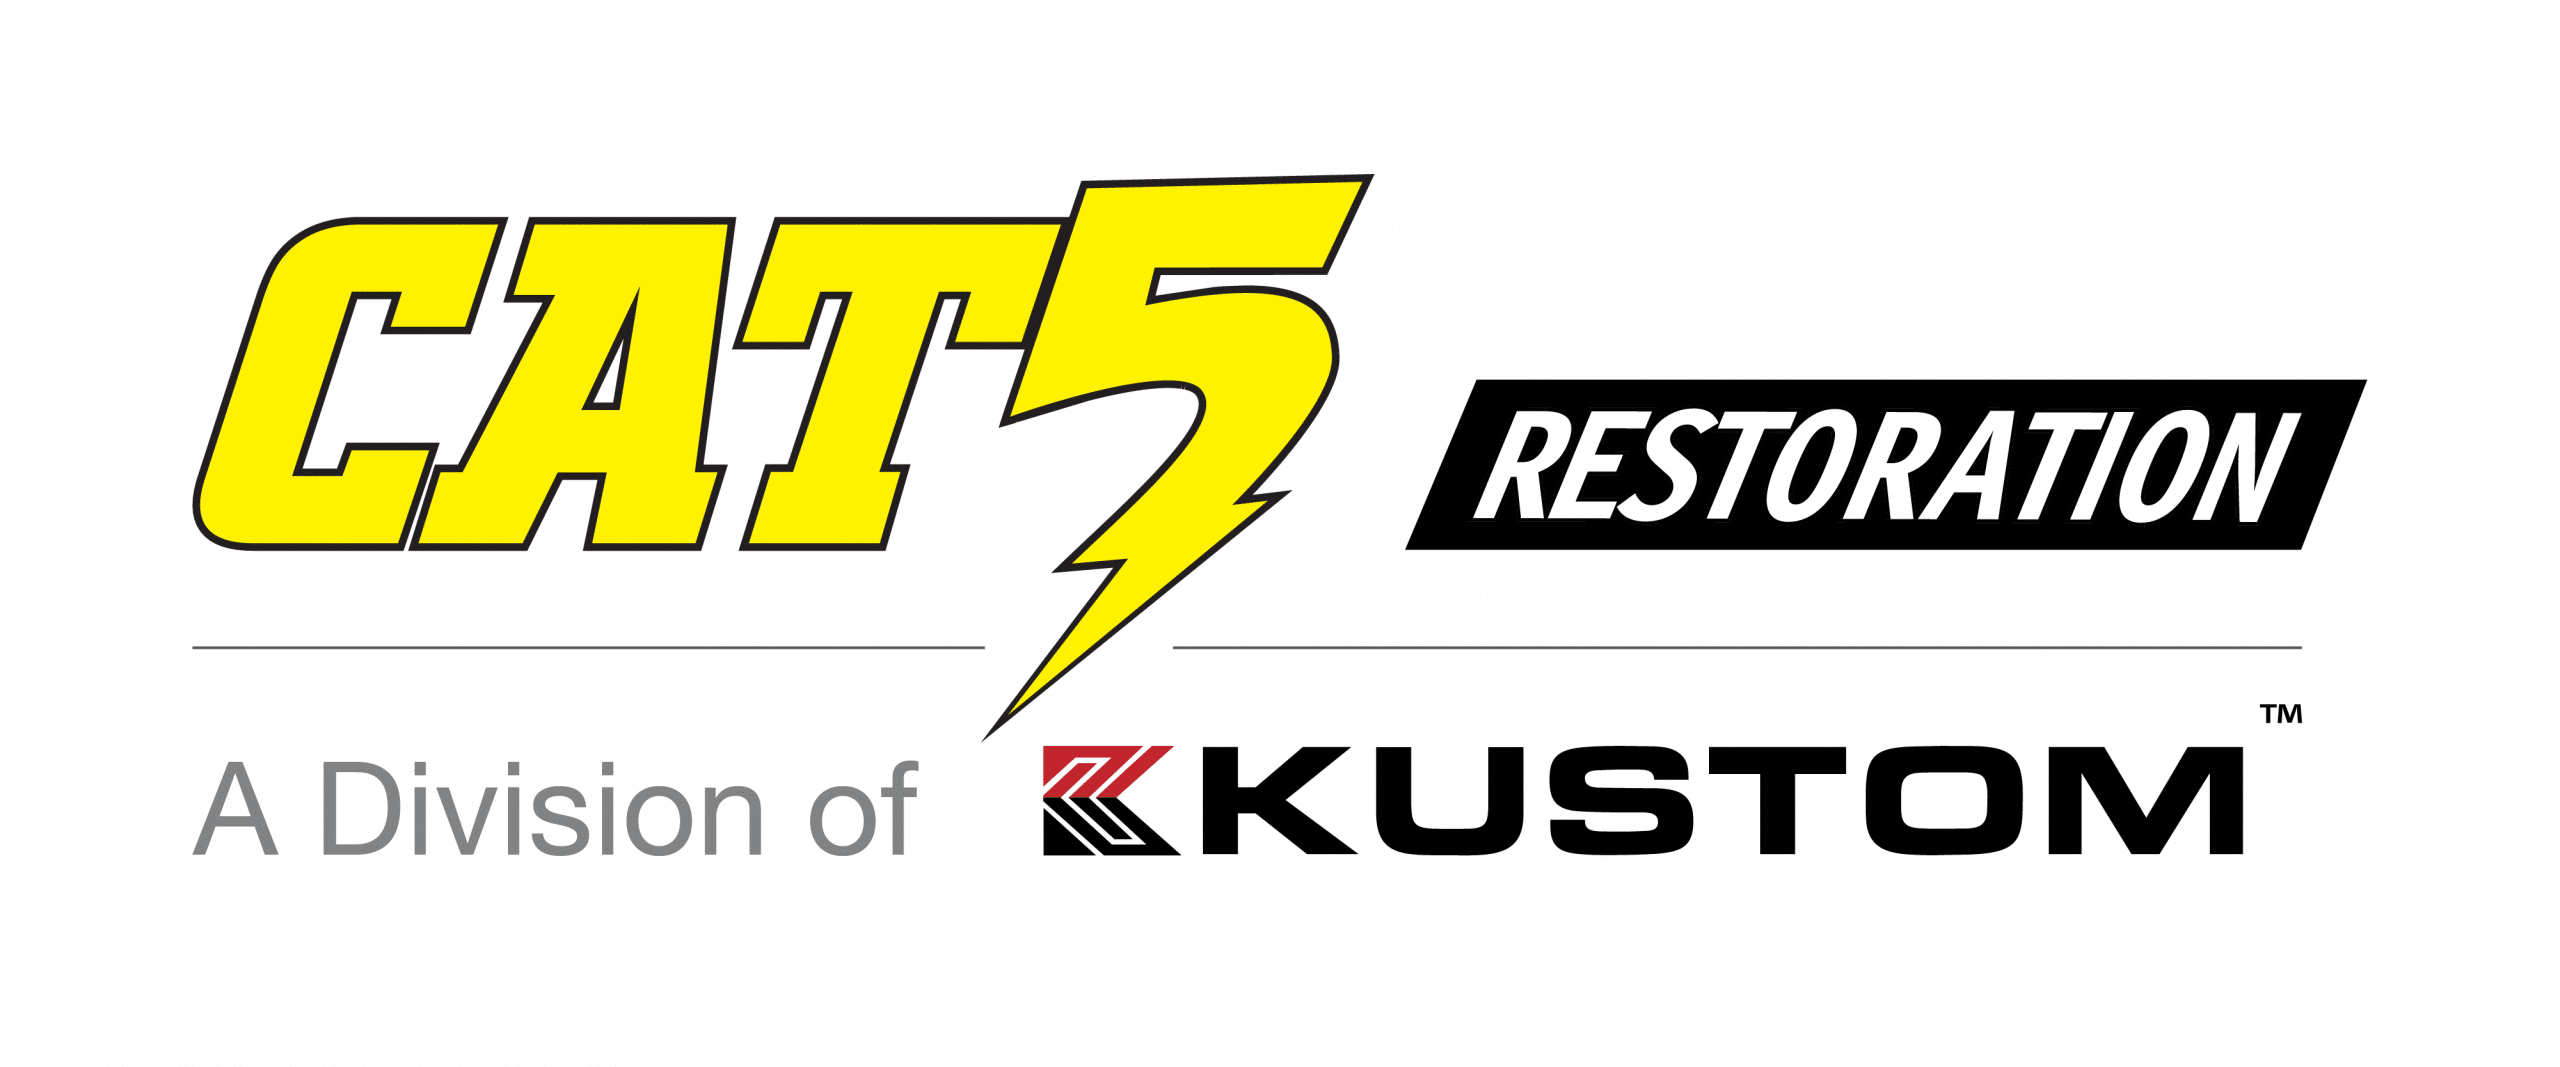 Cat5 Restoration